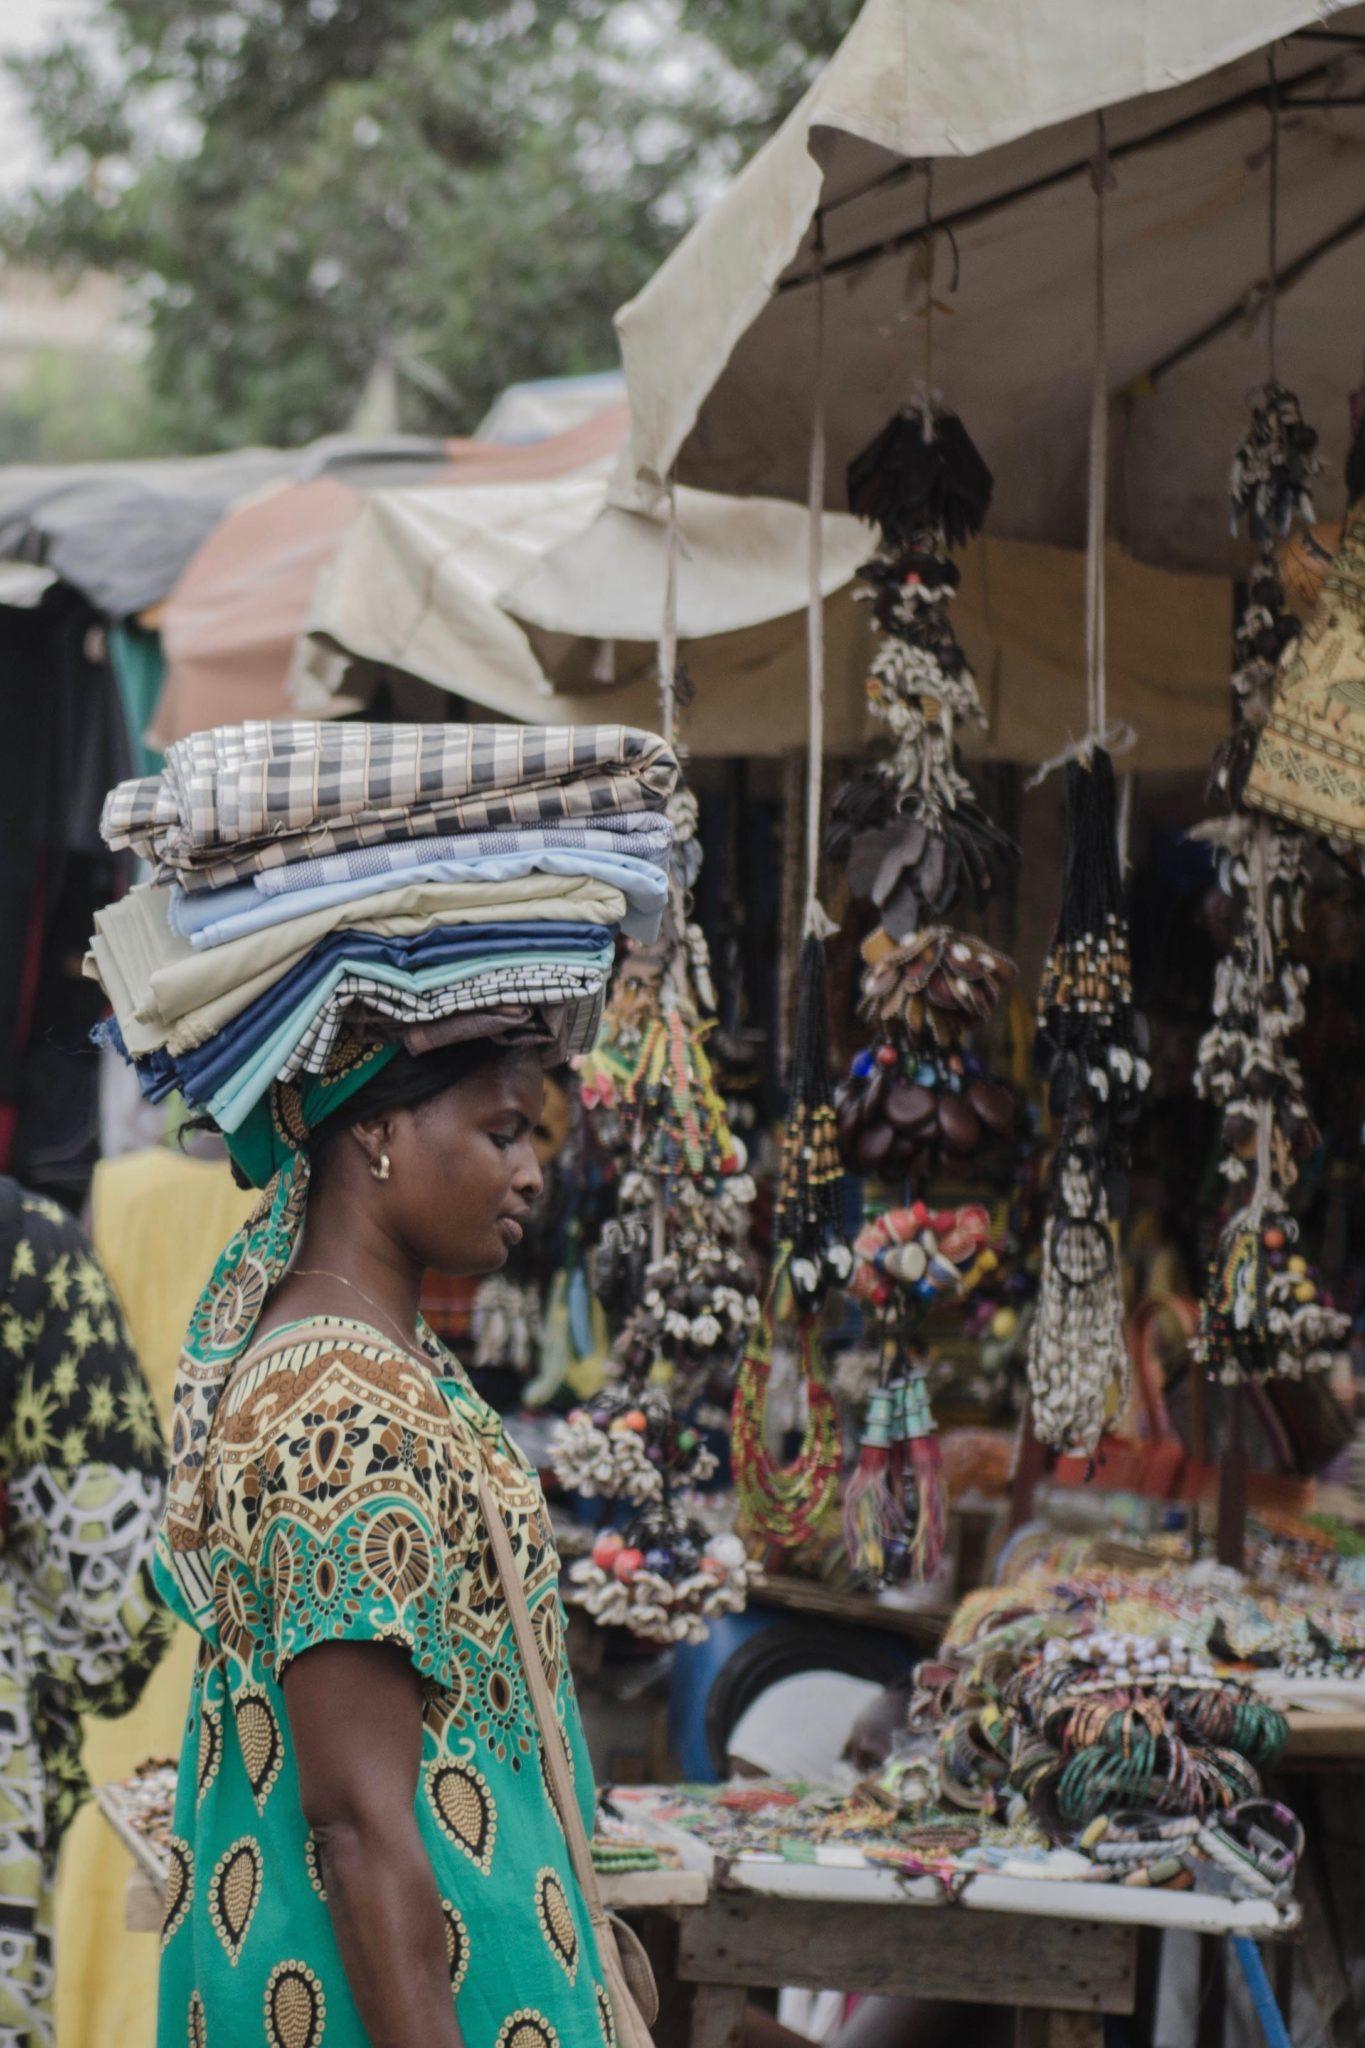 Senegal-Sehenswuerdigkeiten-Frau-Dakar-Stoff